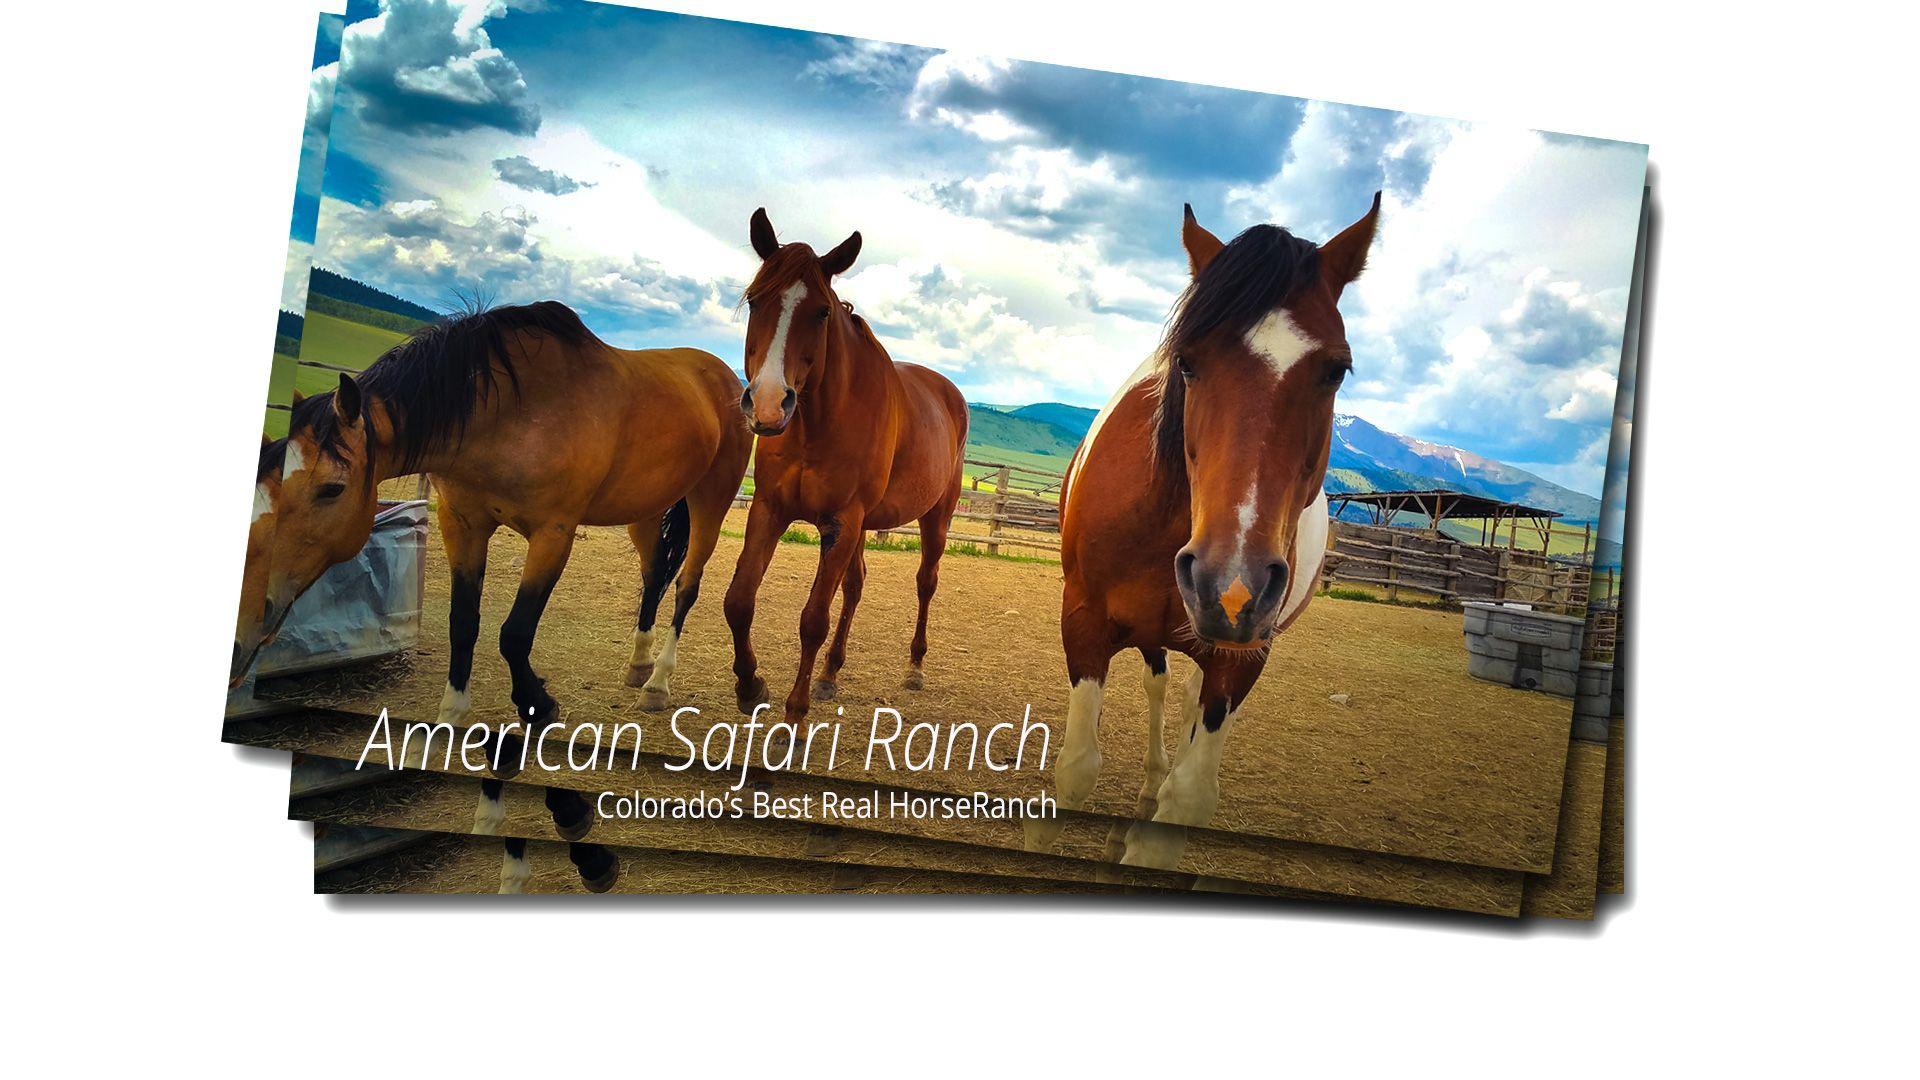 American Safari Ranch Horses Front Page